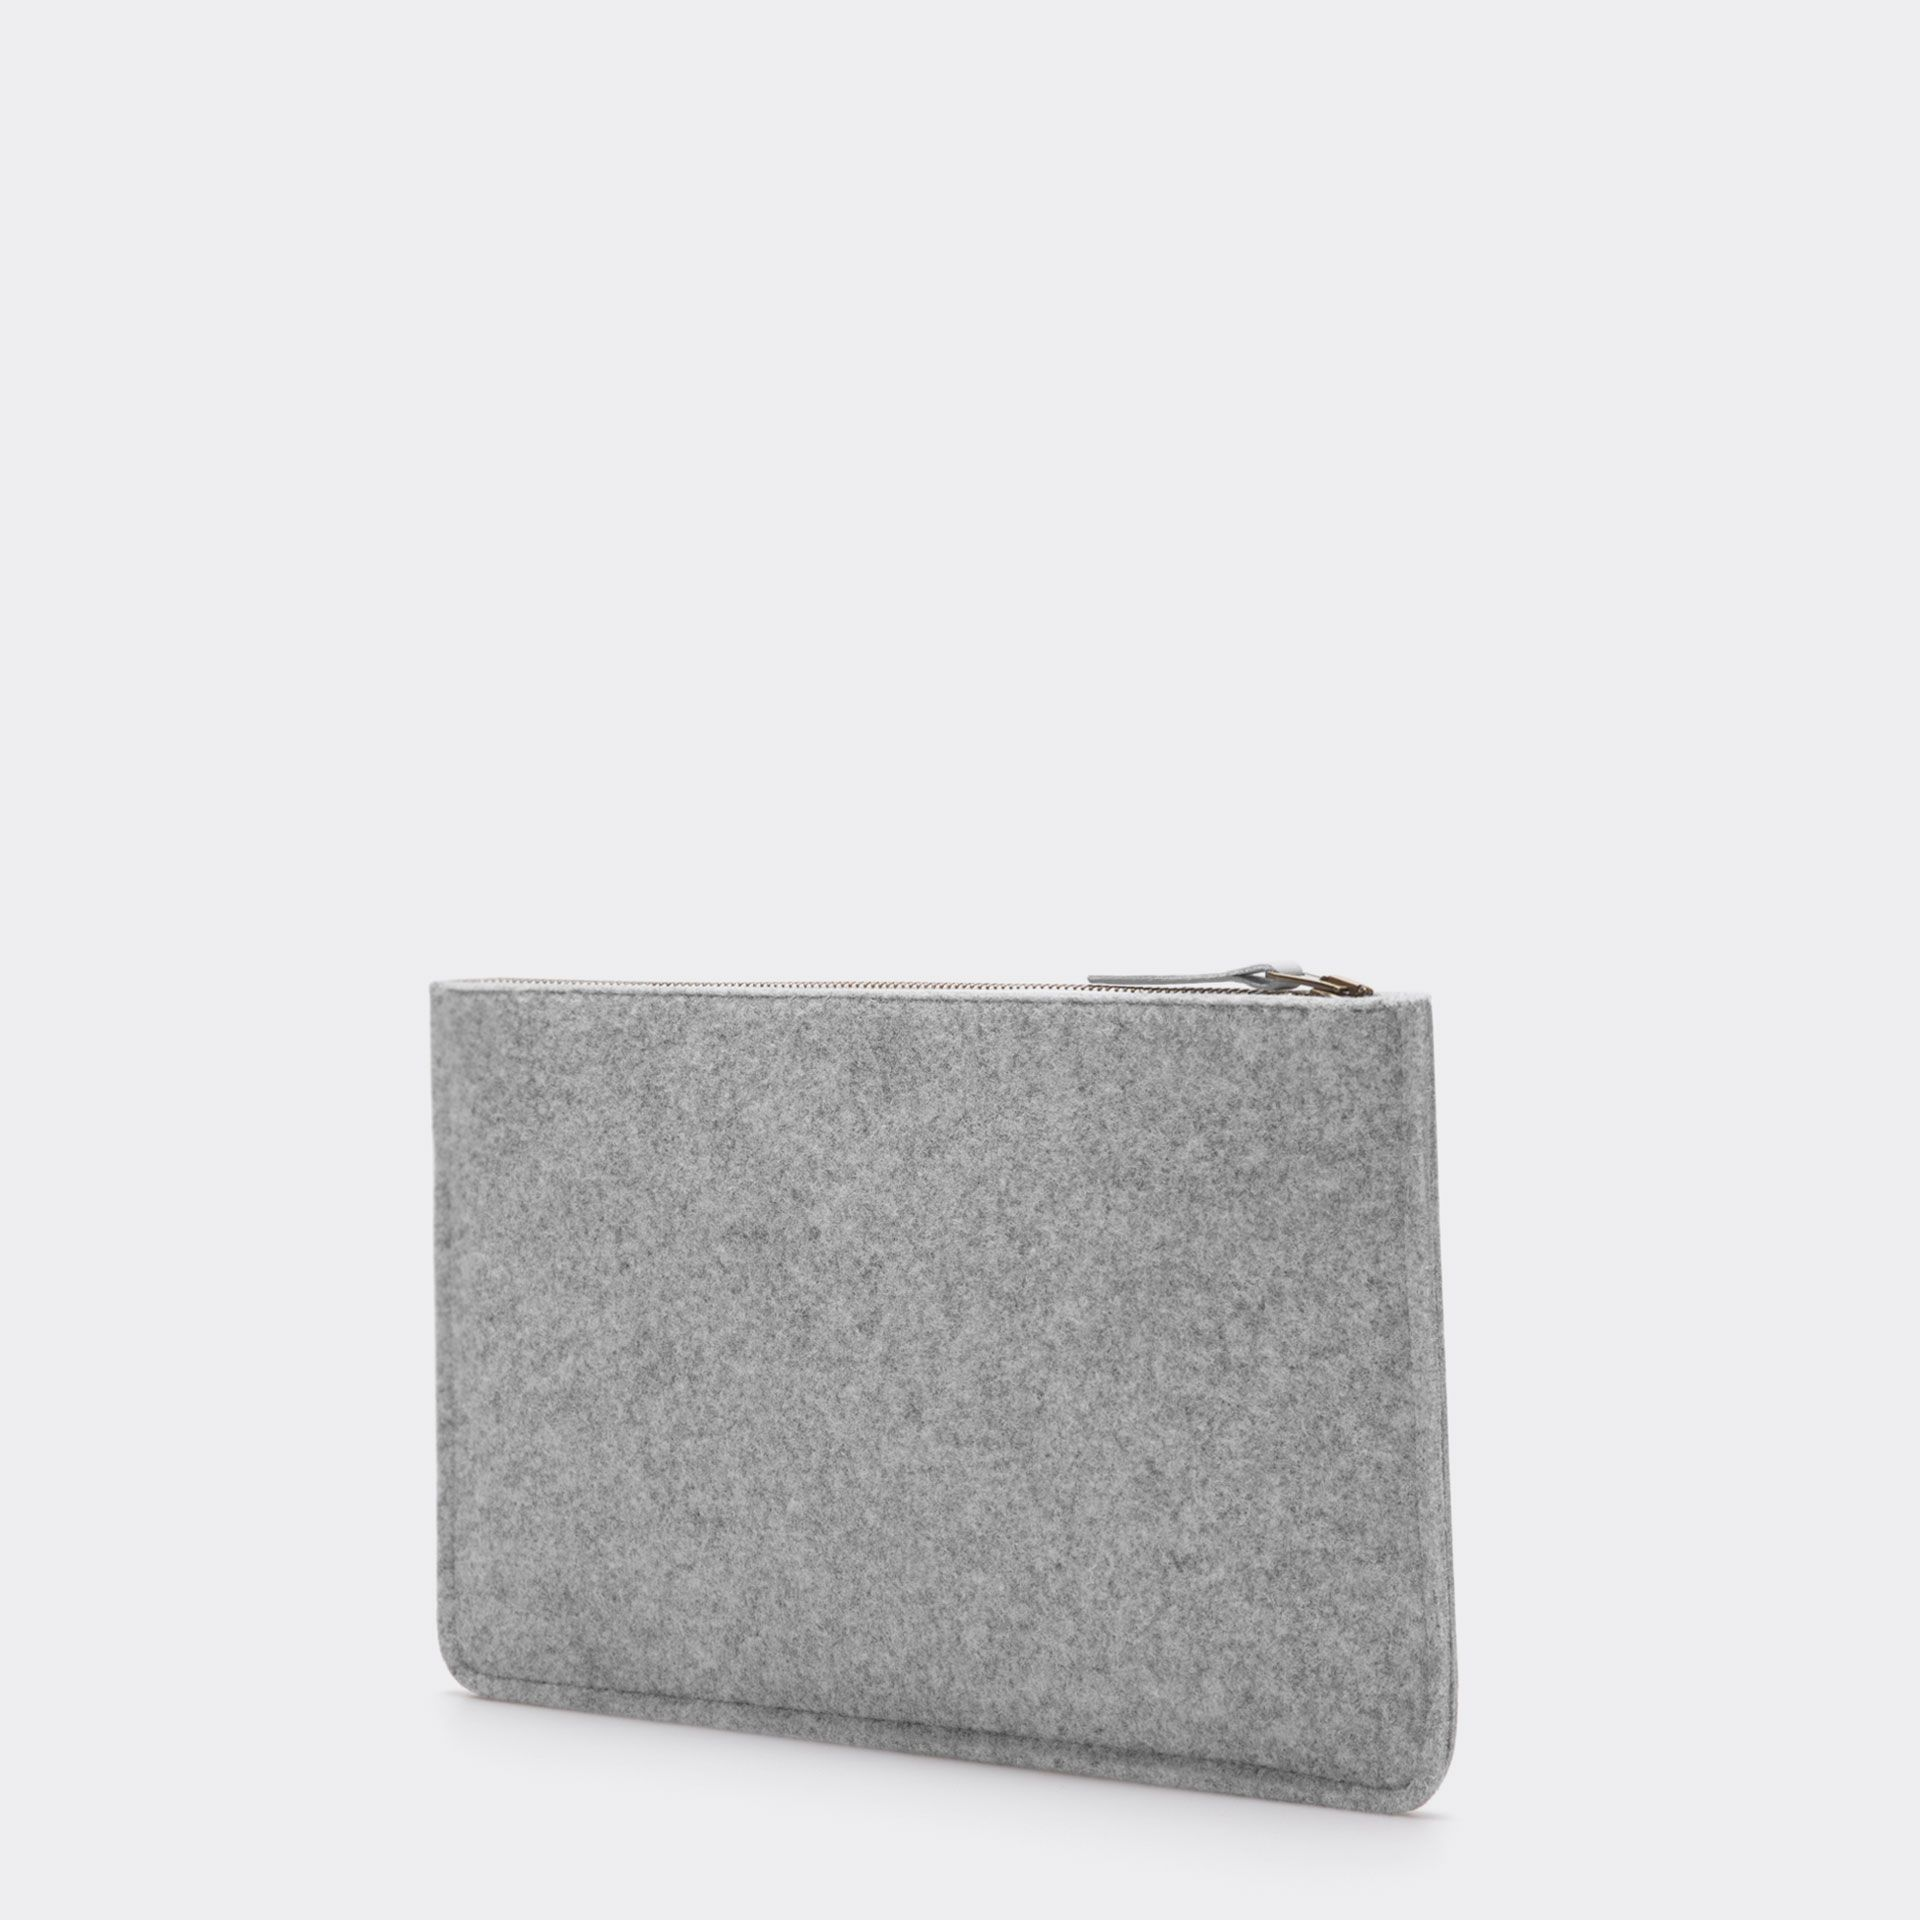 Enveloppe feutre grise | Zara home, Home and Zara